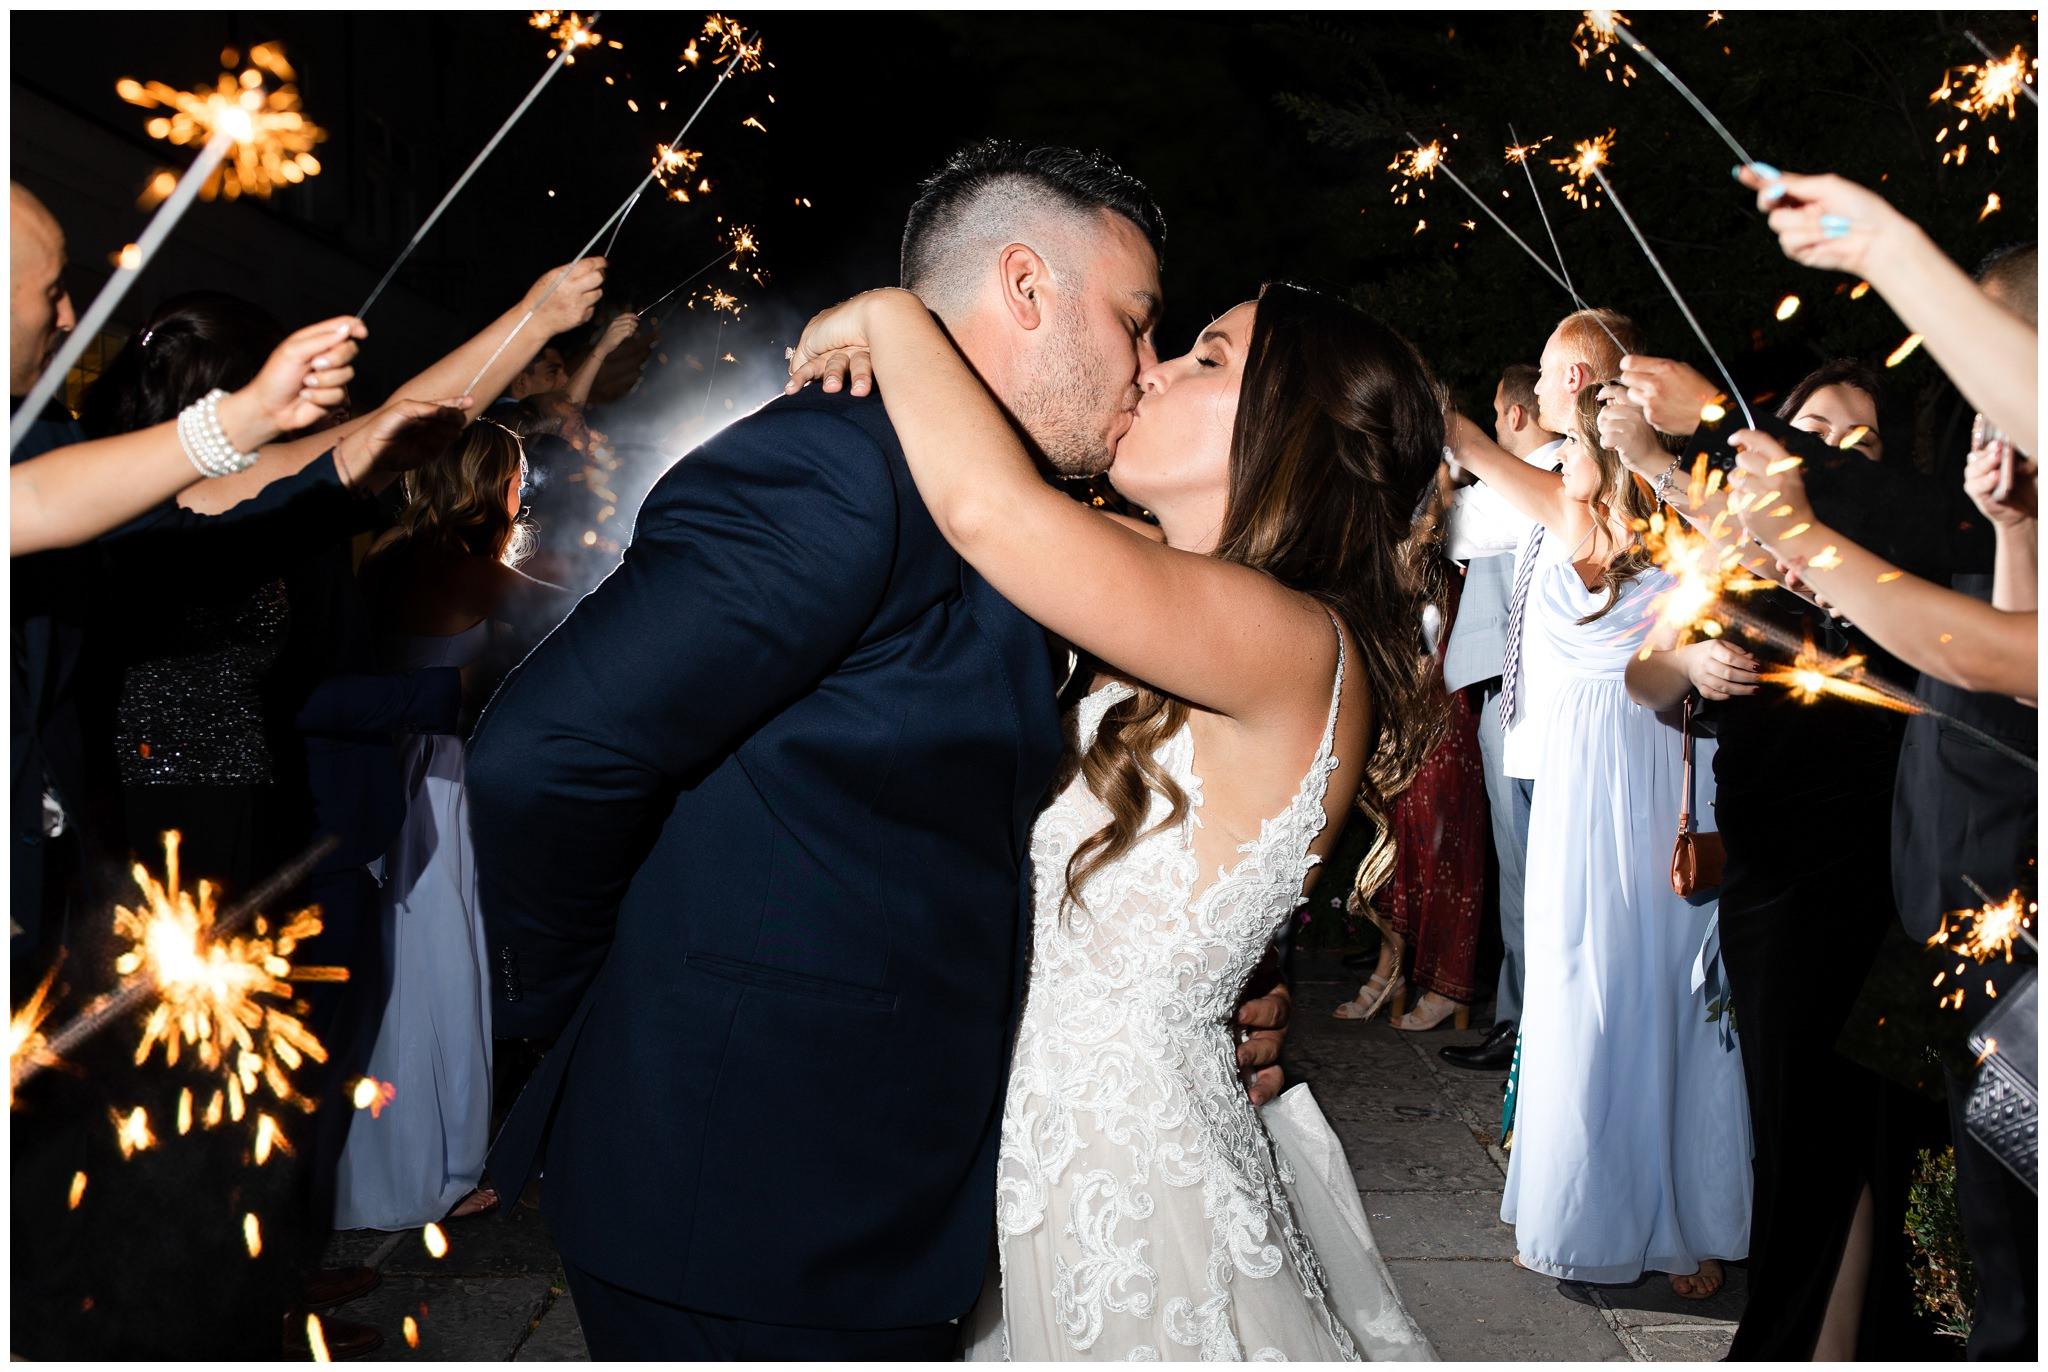 Sparkler exit at Sleepy Ridge Wedding Venue in Orem Utah